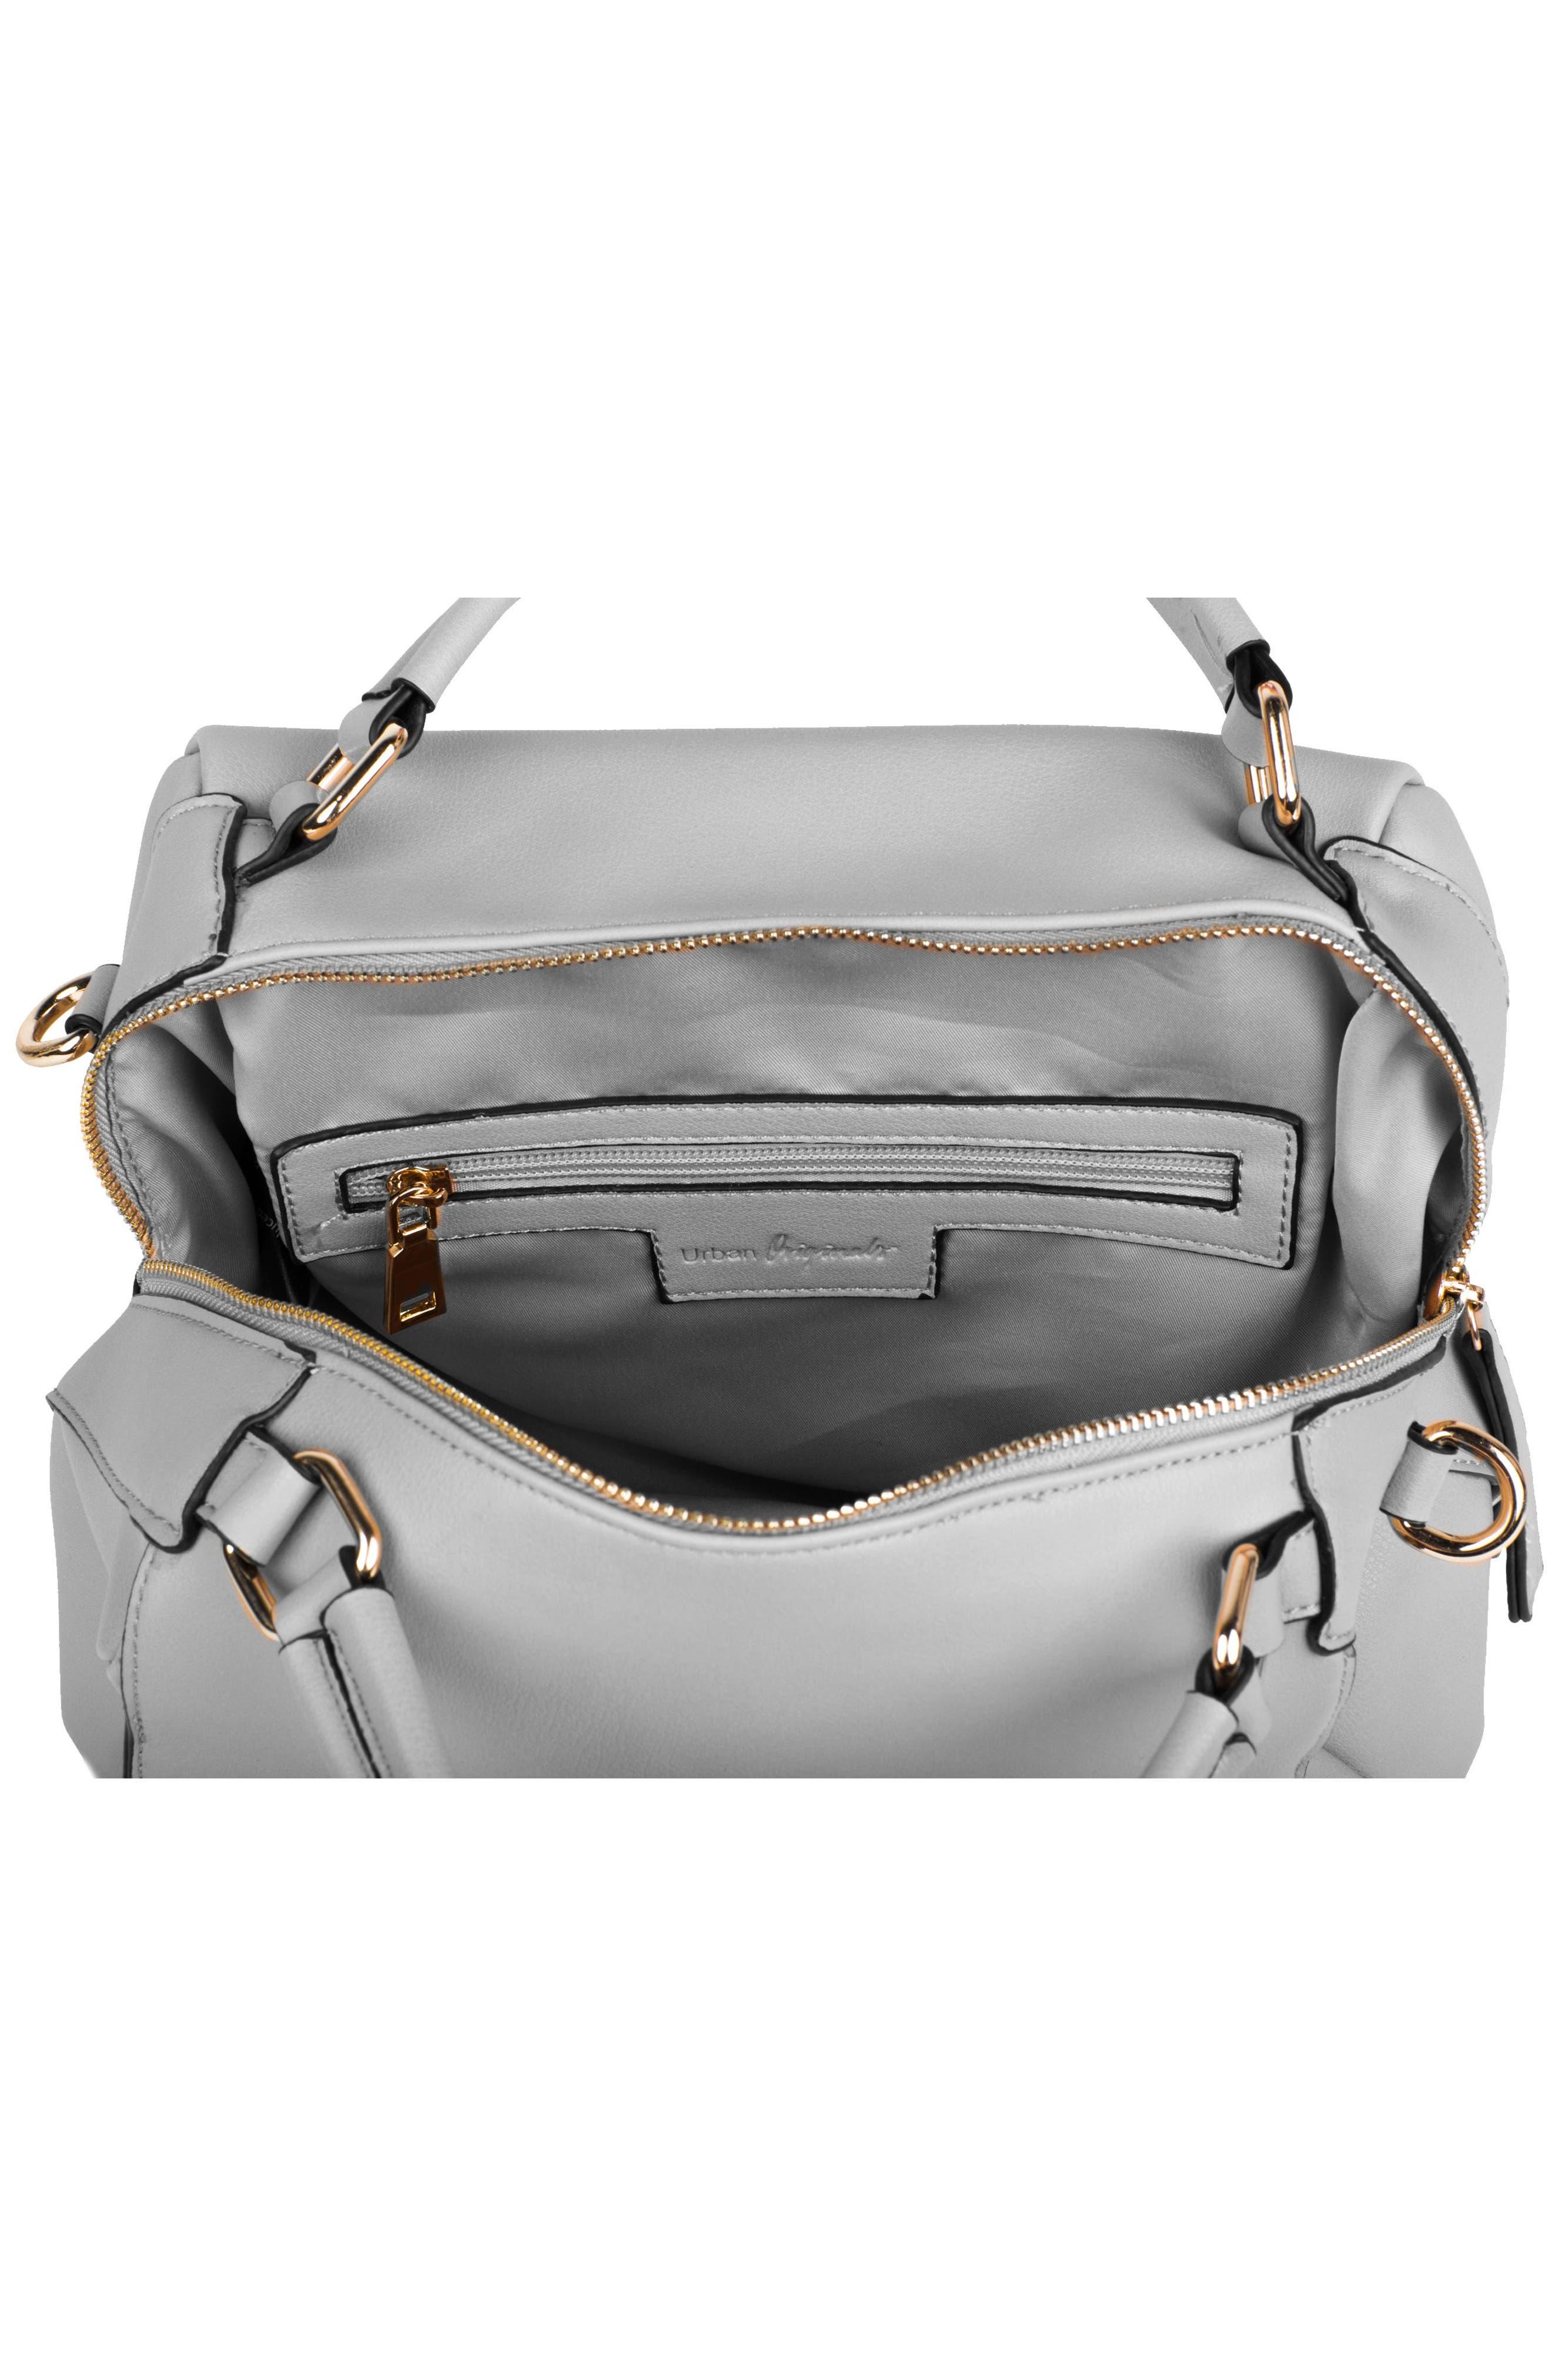 Twilight Vegan Leather Convertible Tote Bag,                             Alternate thumbnail 3, color,                             020